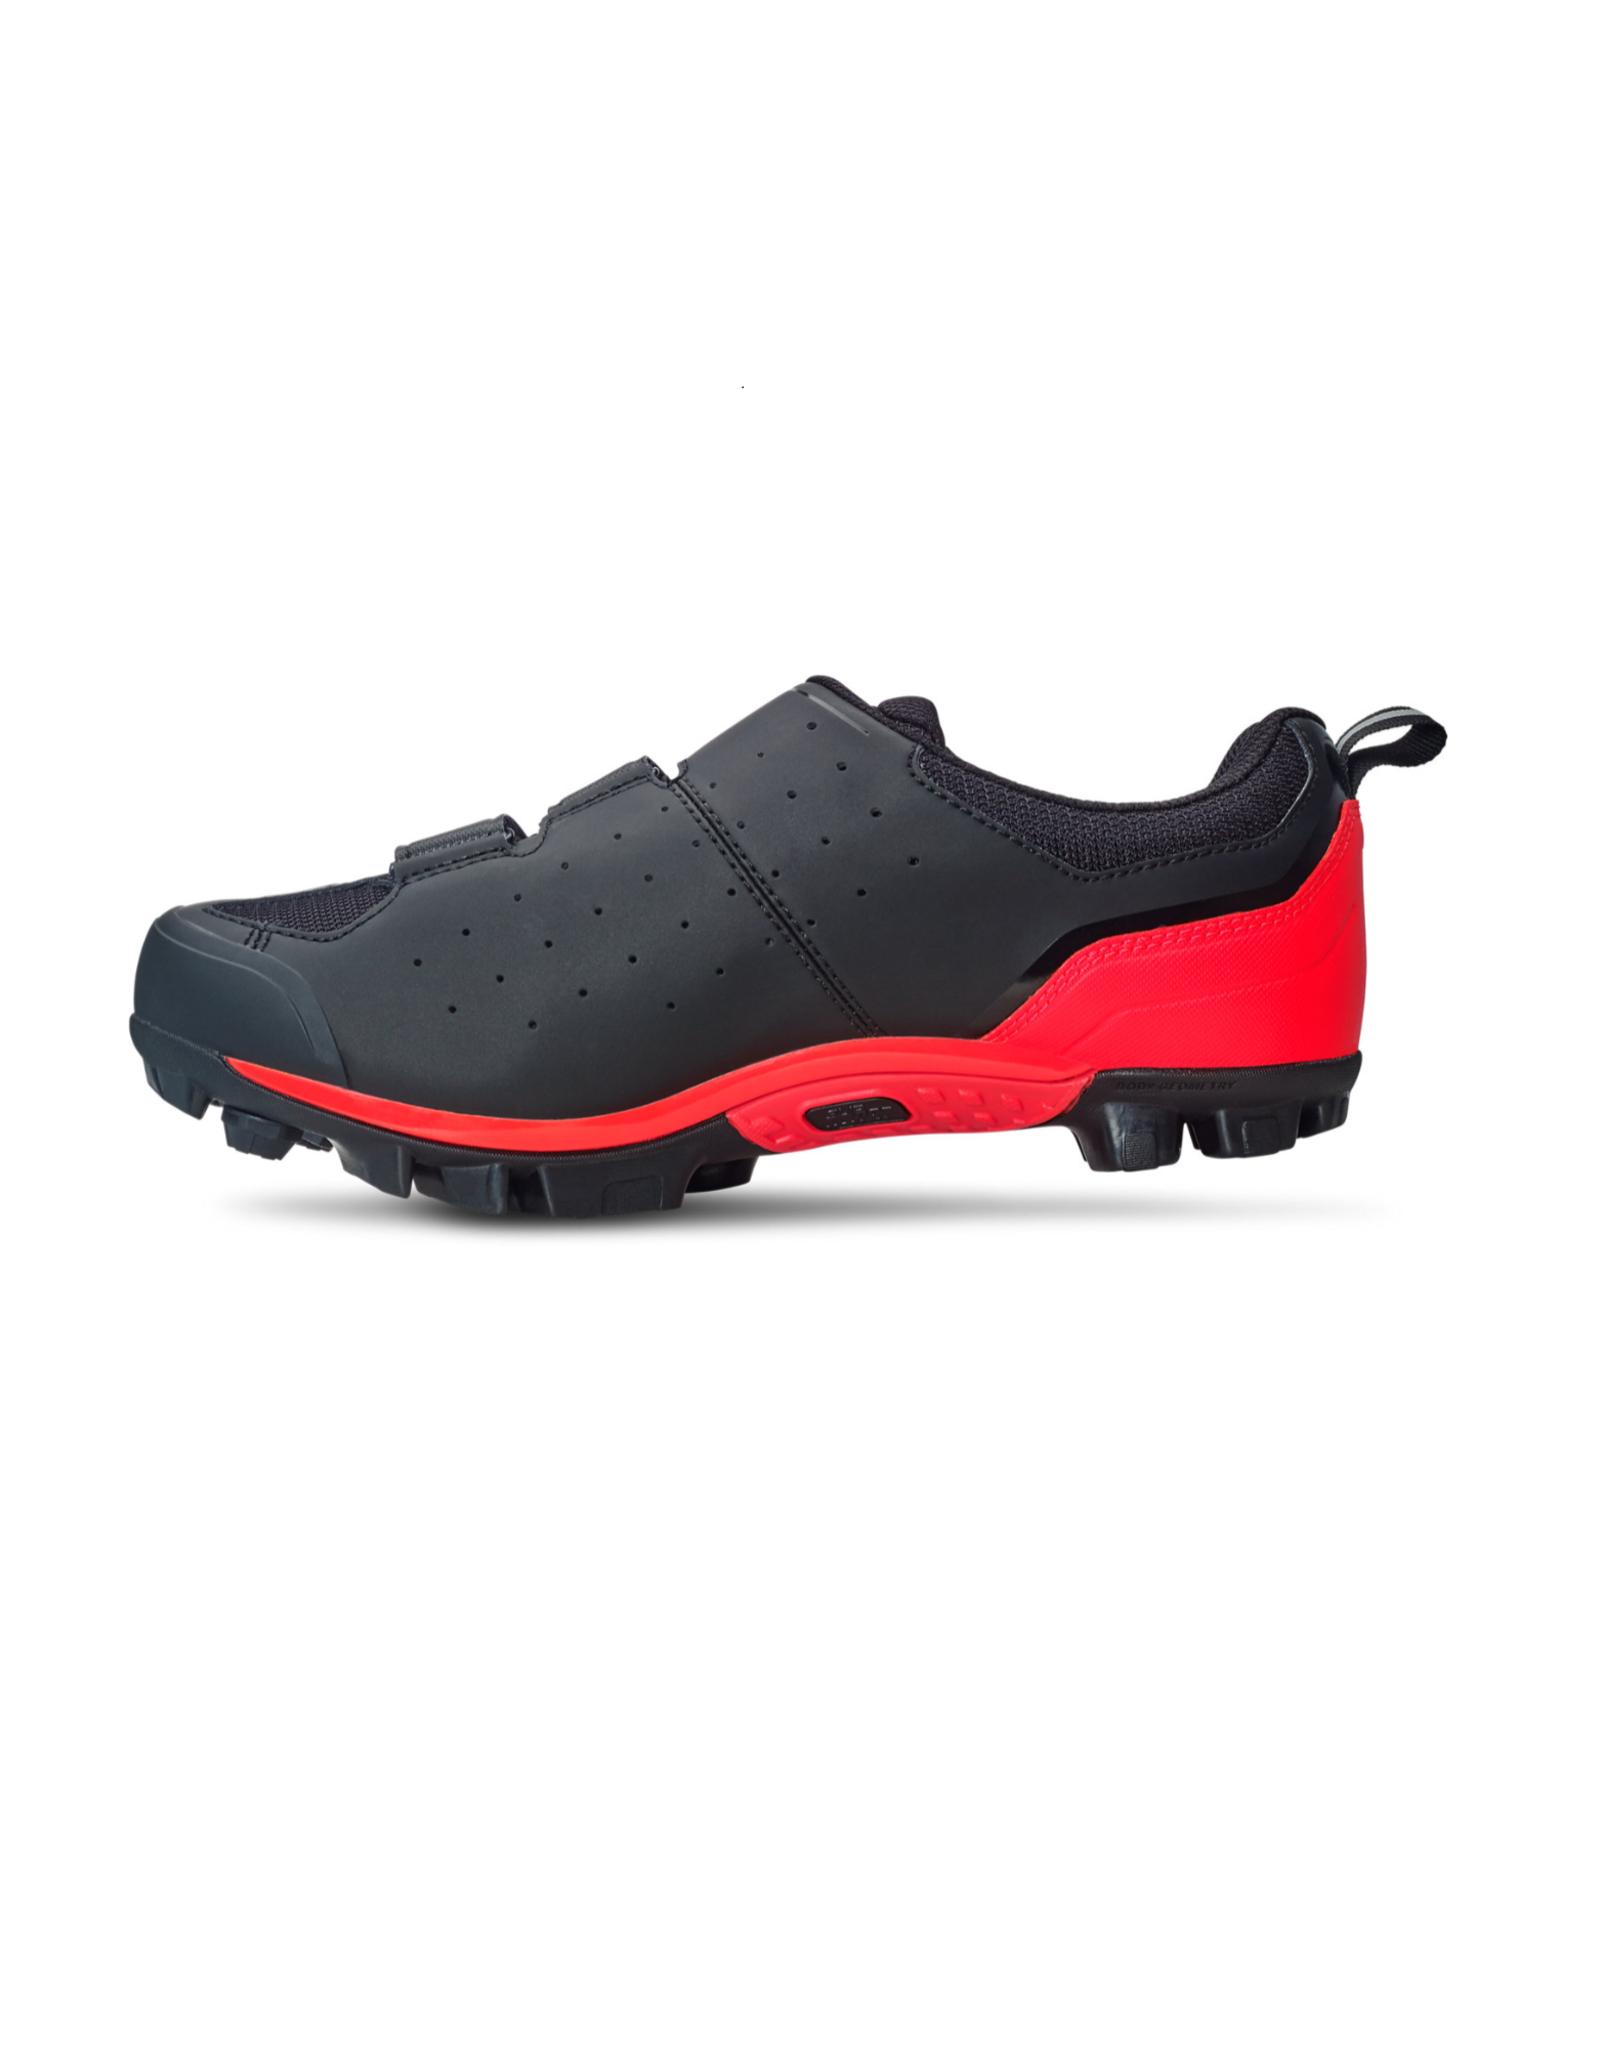 Specialized Shoes - Comp MTB SPD